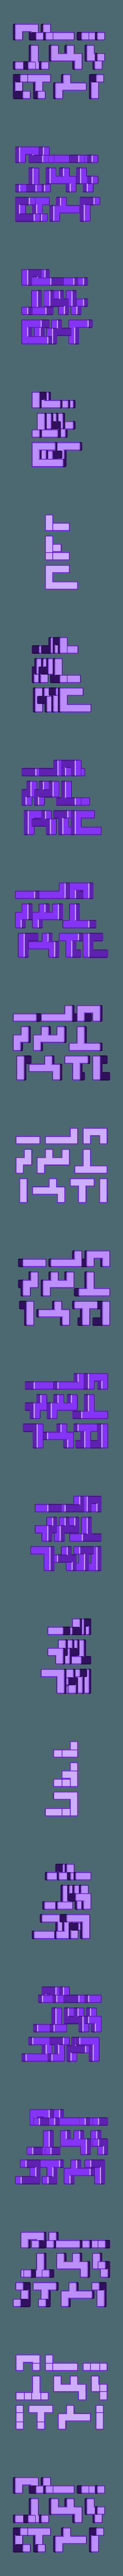 4x4 Puzzle Cube.stl Download free STL file 4x4 Puzzle Cube • 3D printer model, FerryTeacher